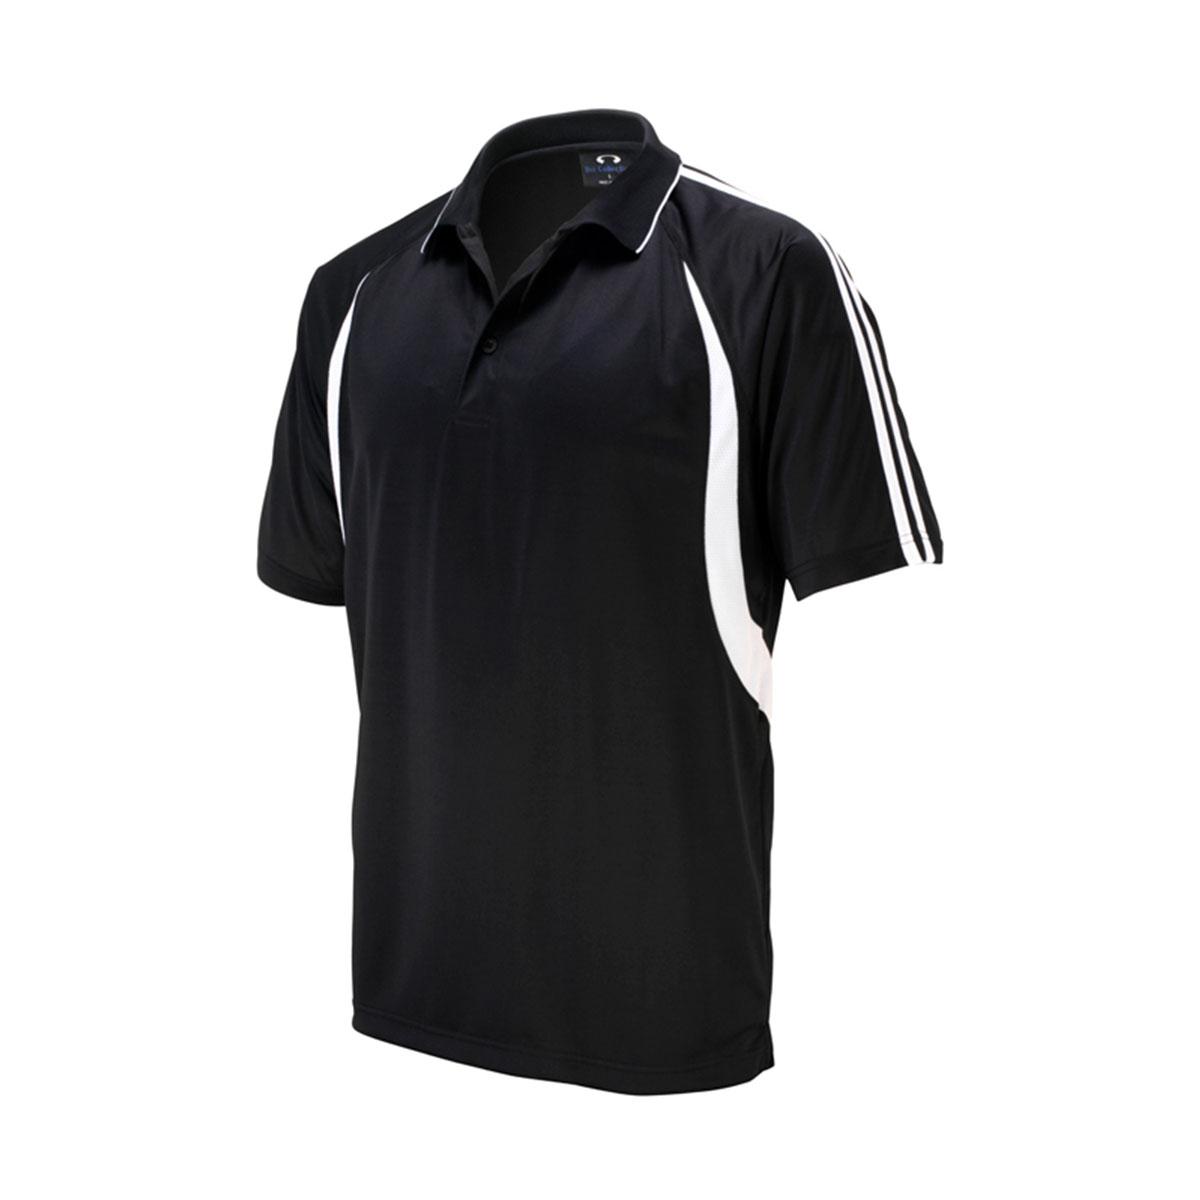 Mens Flash Polo-Black / White